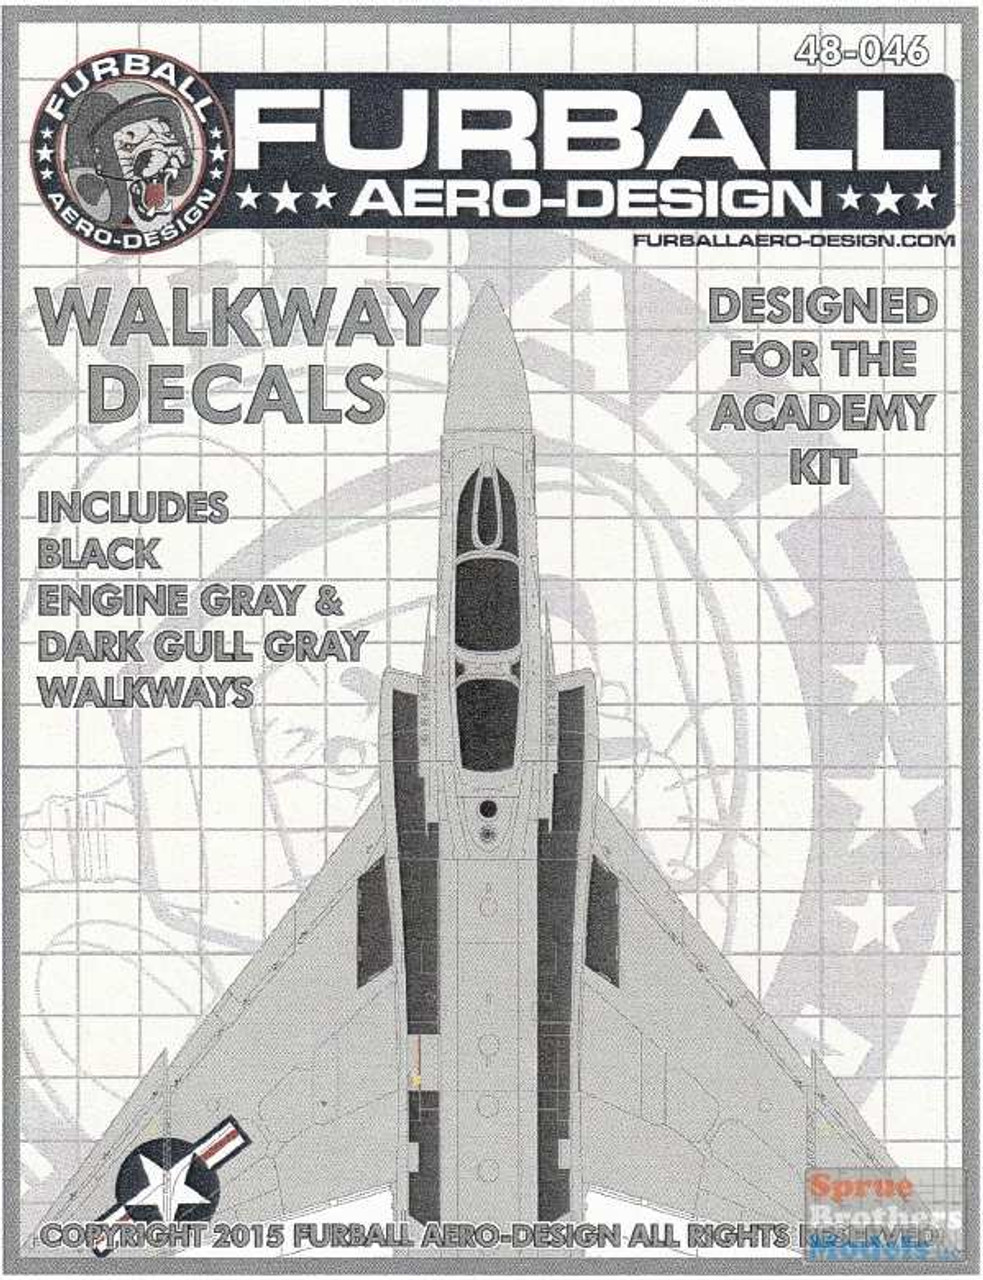 FUR48046 1:48 Furball Aero Design USN F-4 Phantom II Walkway Decals (ACA kit)